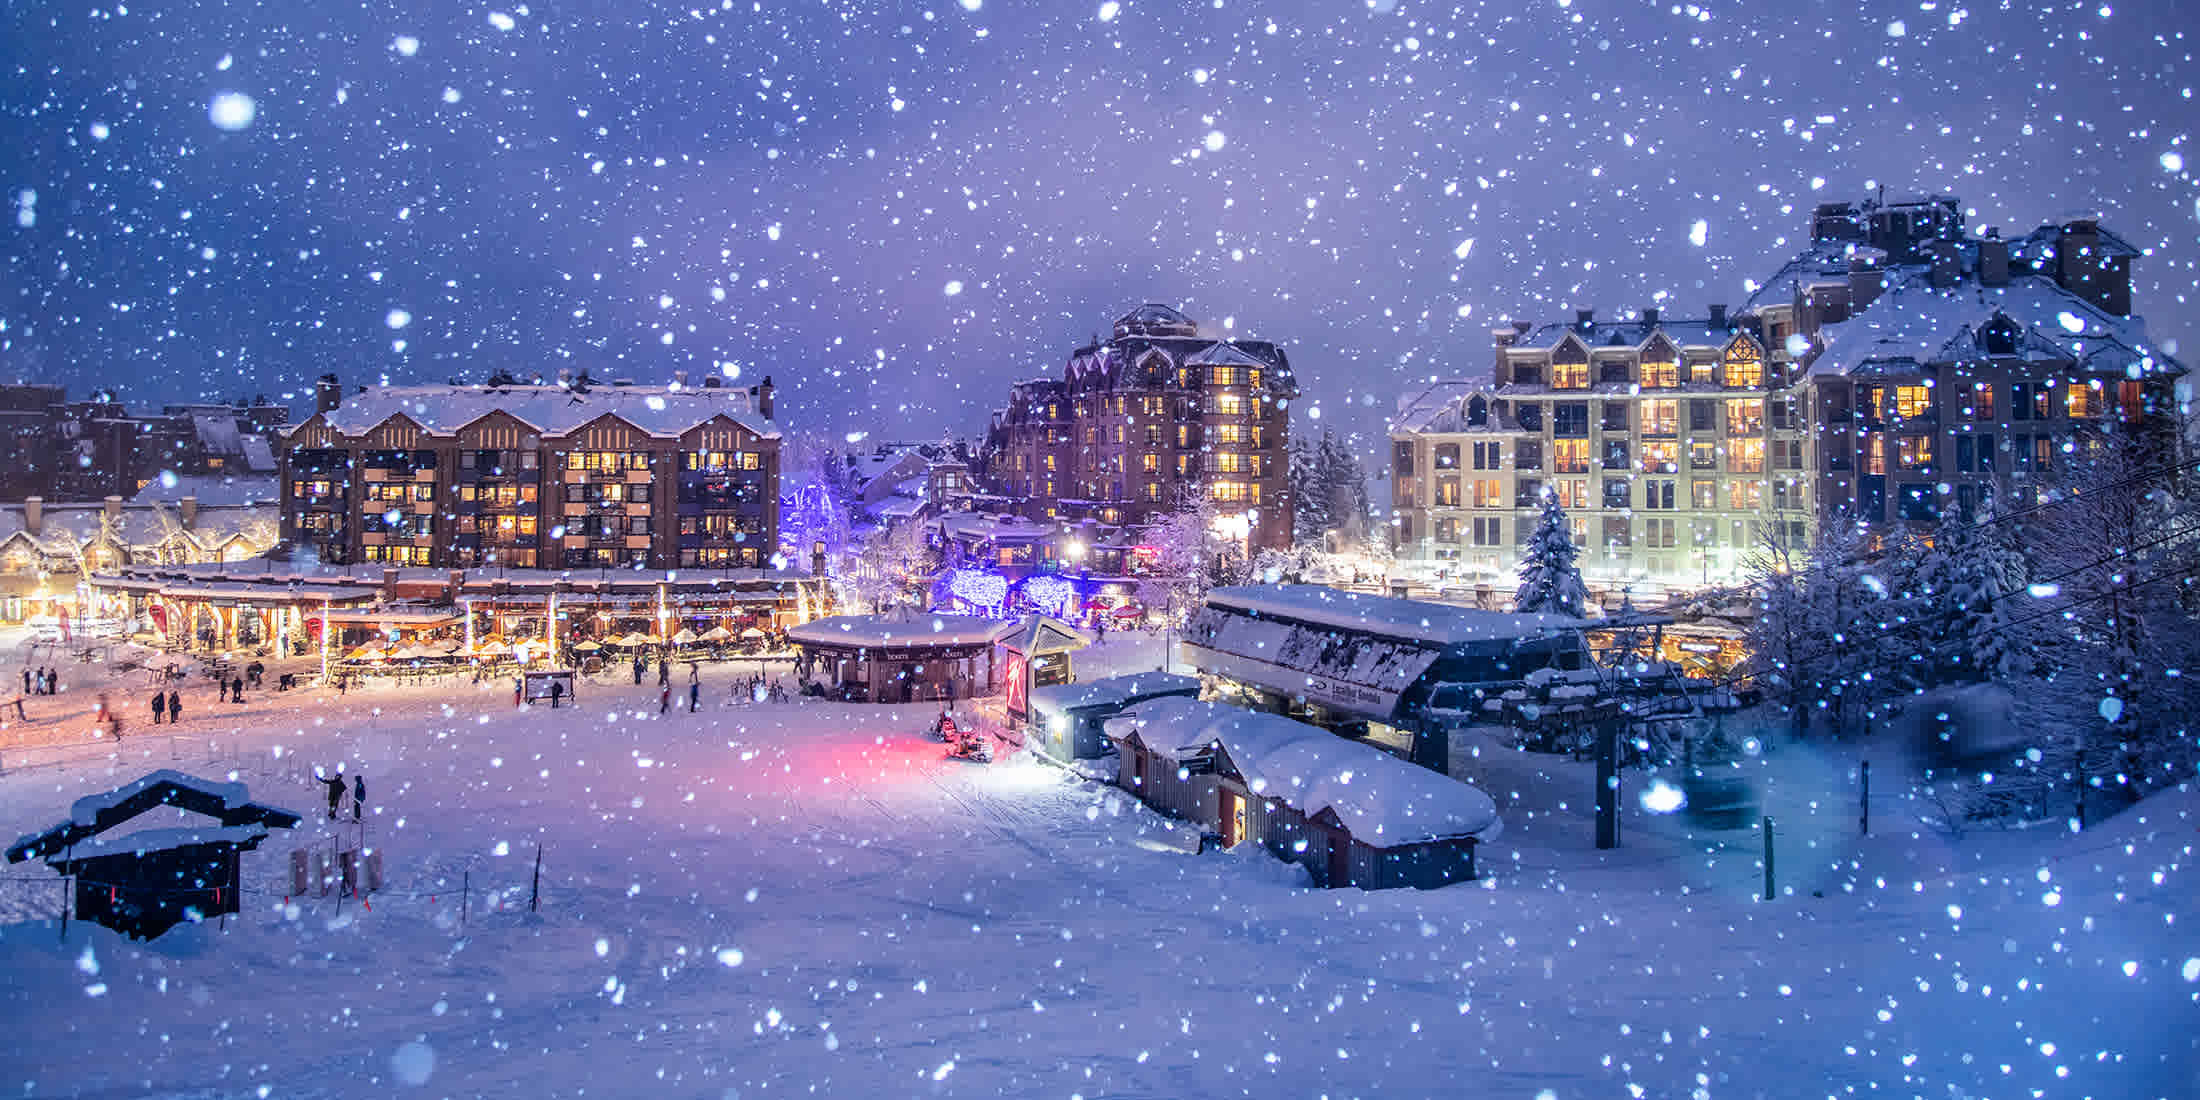 Whistler Village in the winter